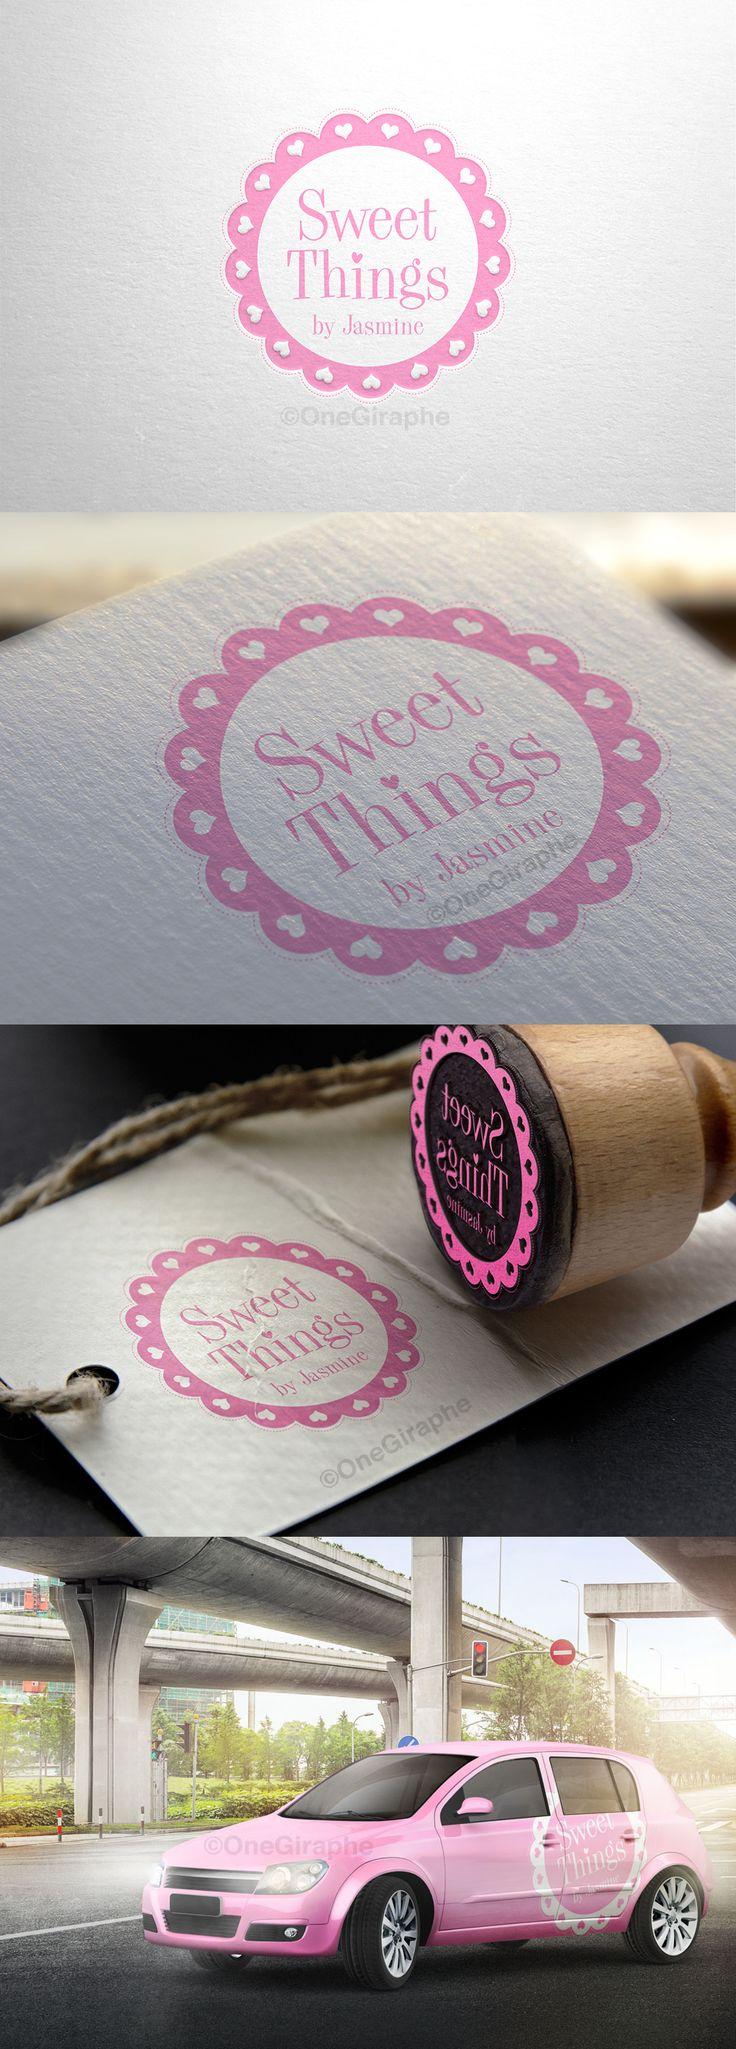 Brand for Sweet Things by Jasmine #portfolio #cake #cupcake #pink  #stamp #car branded #sweets #pink #logo #logodesign #brand #branding #brandidentity #graphic #graphicdesign #graphicdesigner #designer #foodgram #instegram #cakegram #owners #needlogo #logodesigner